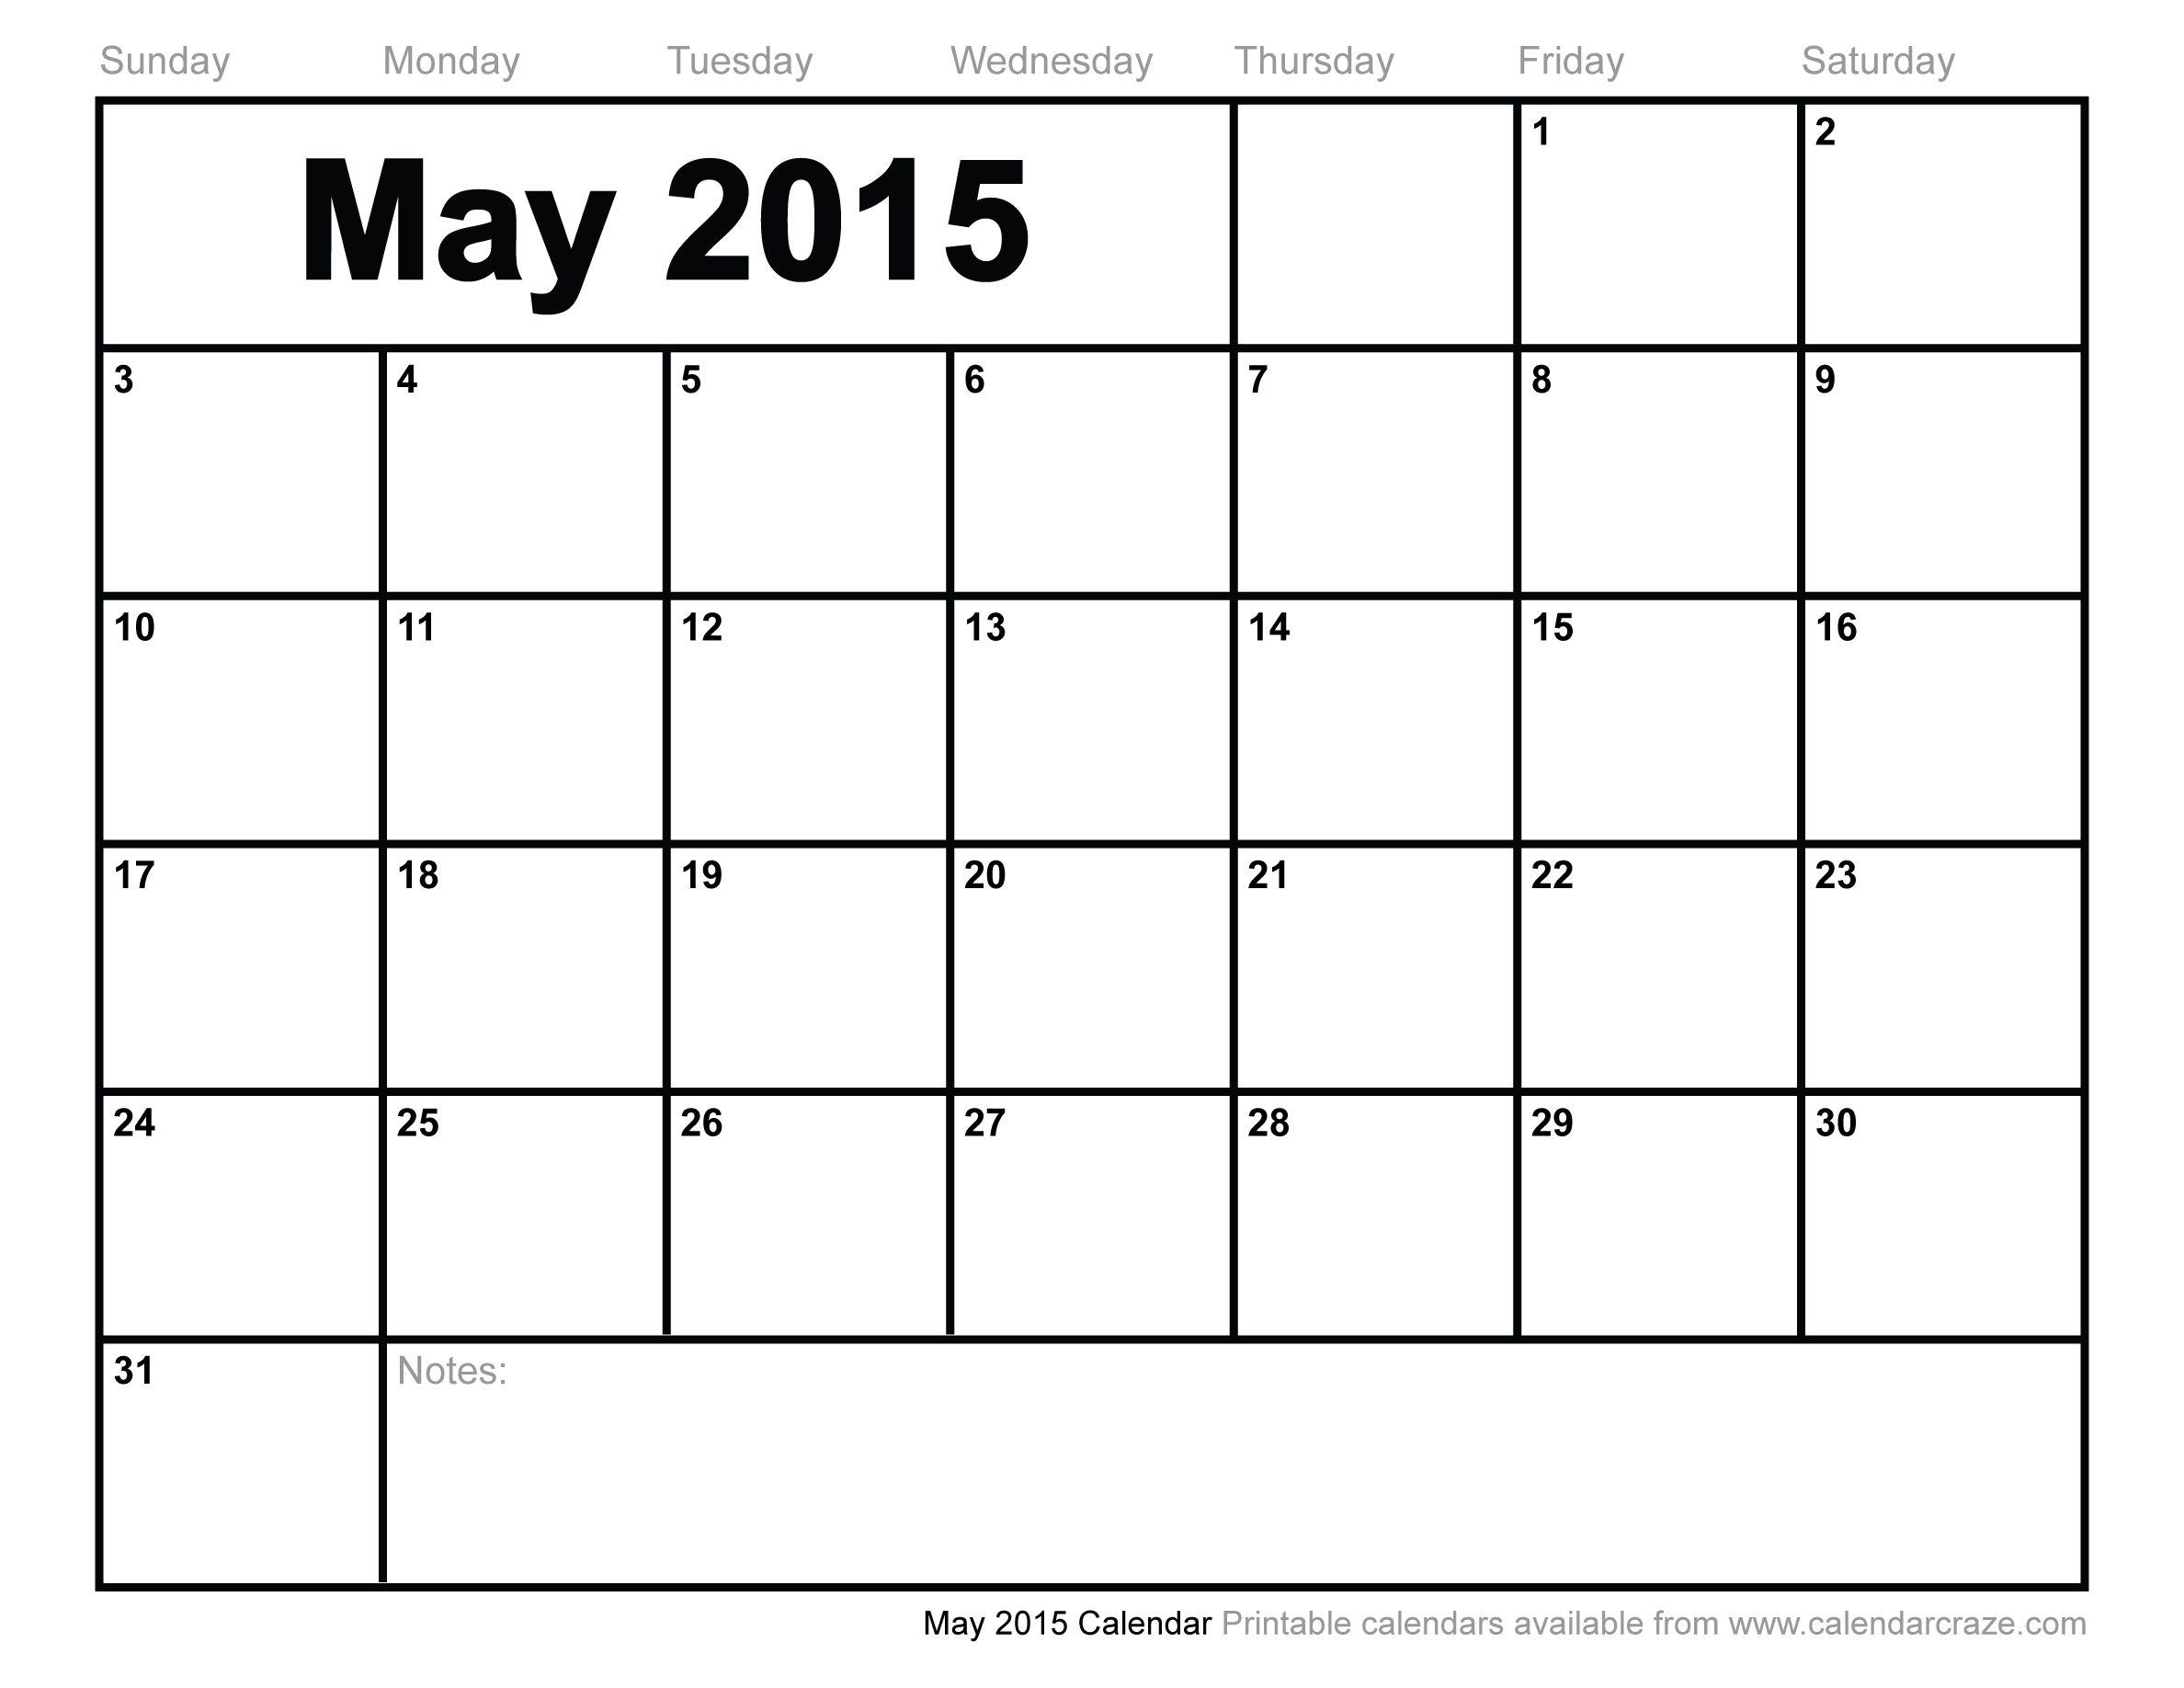 free october 2015 calendars